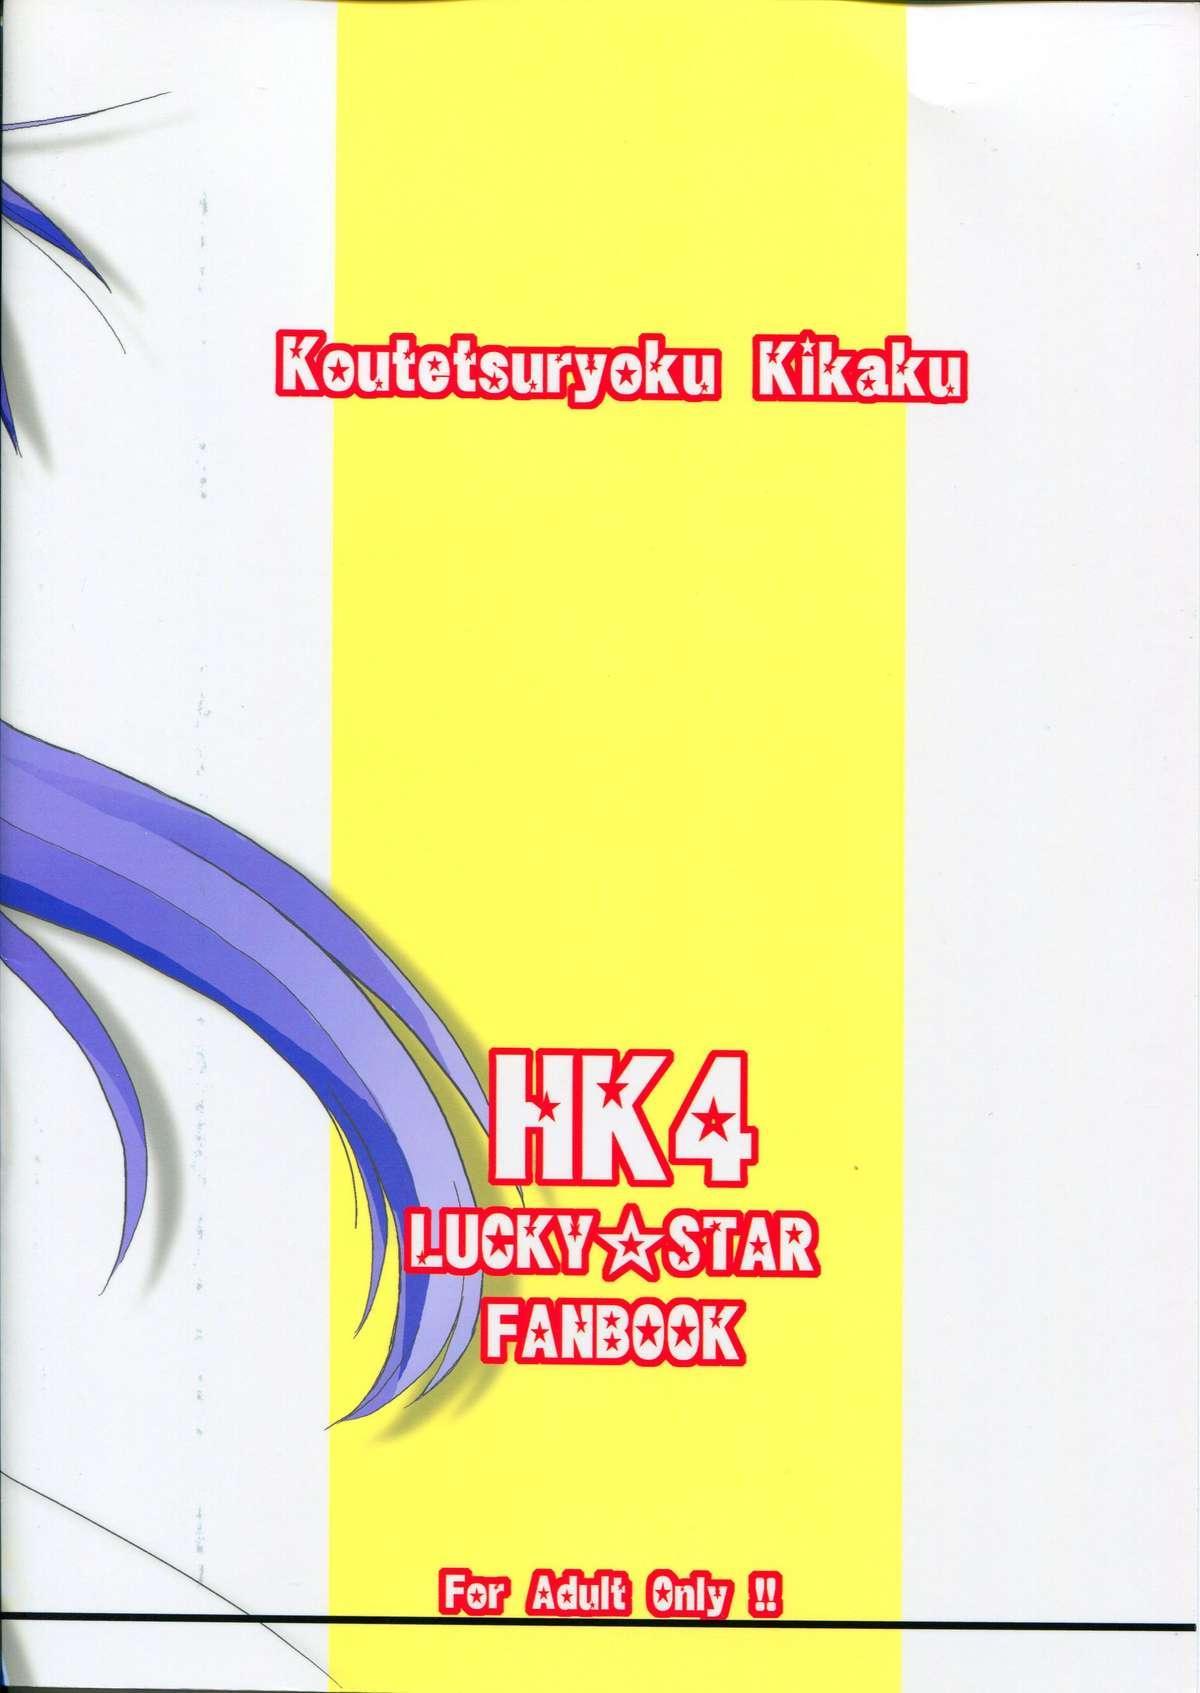 HK4 2